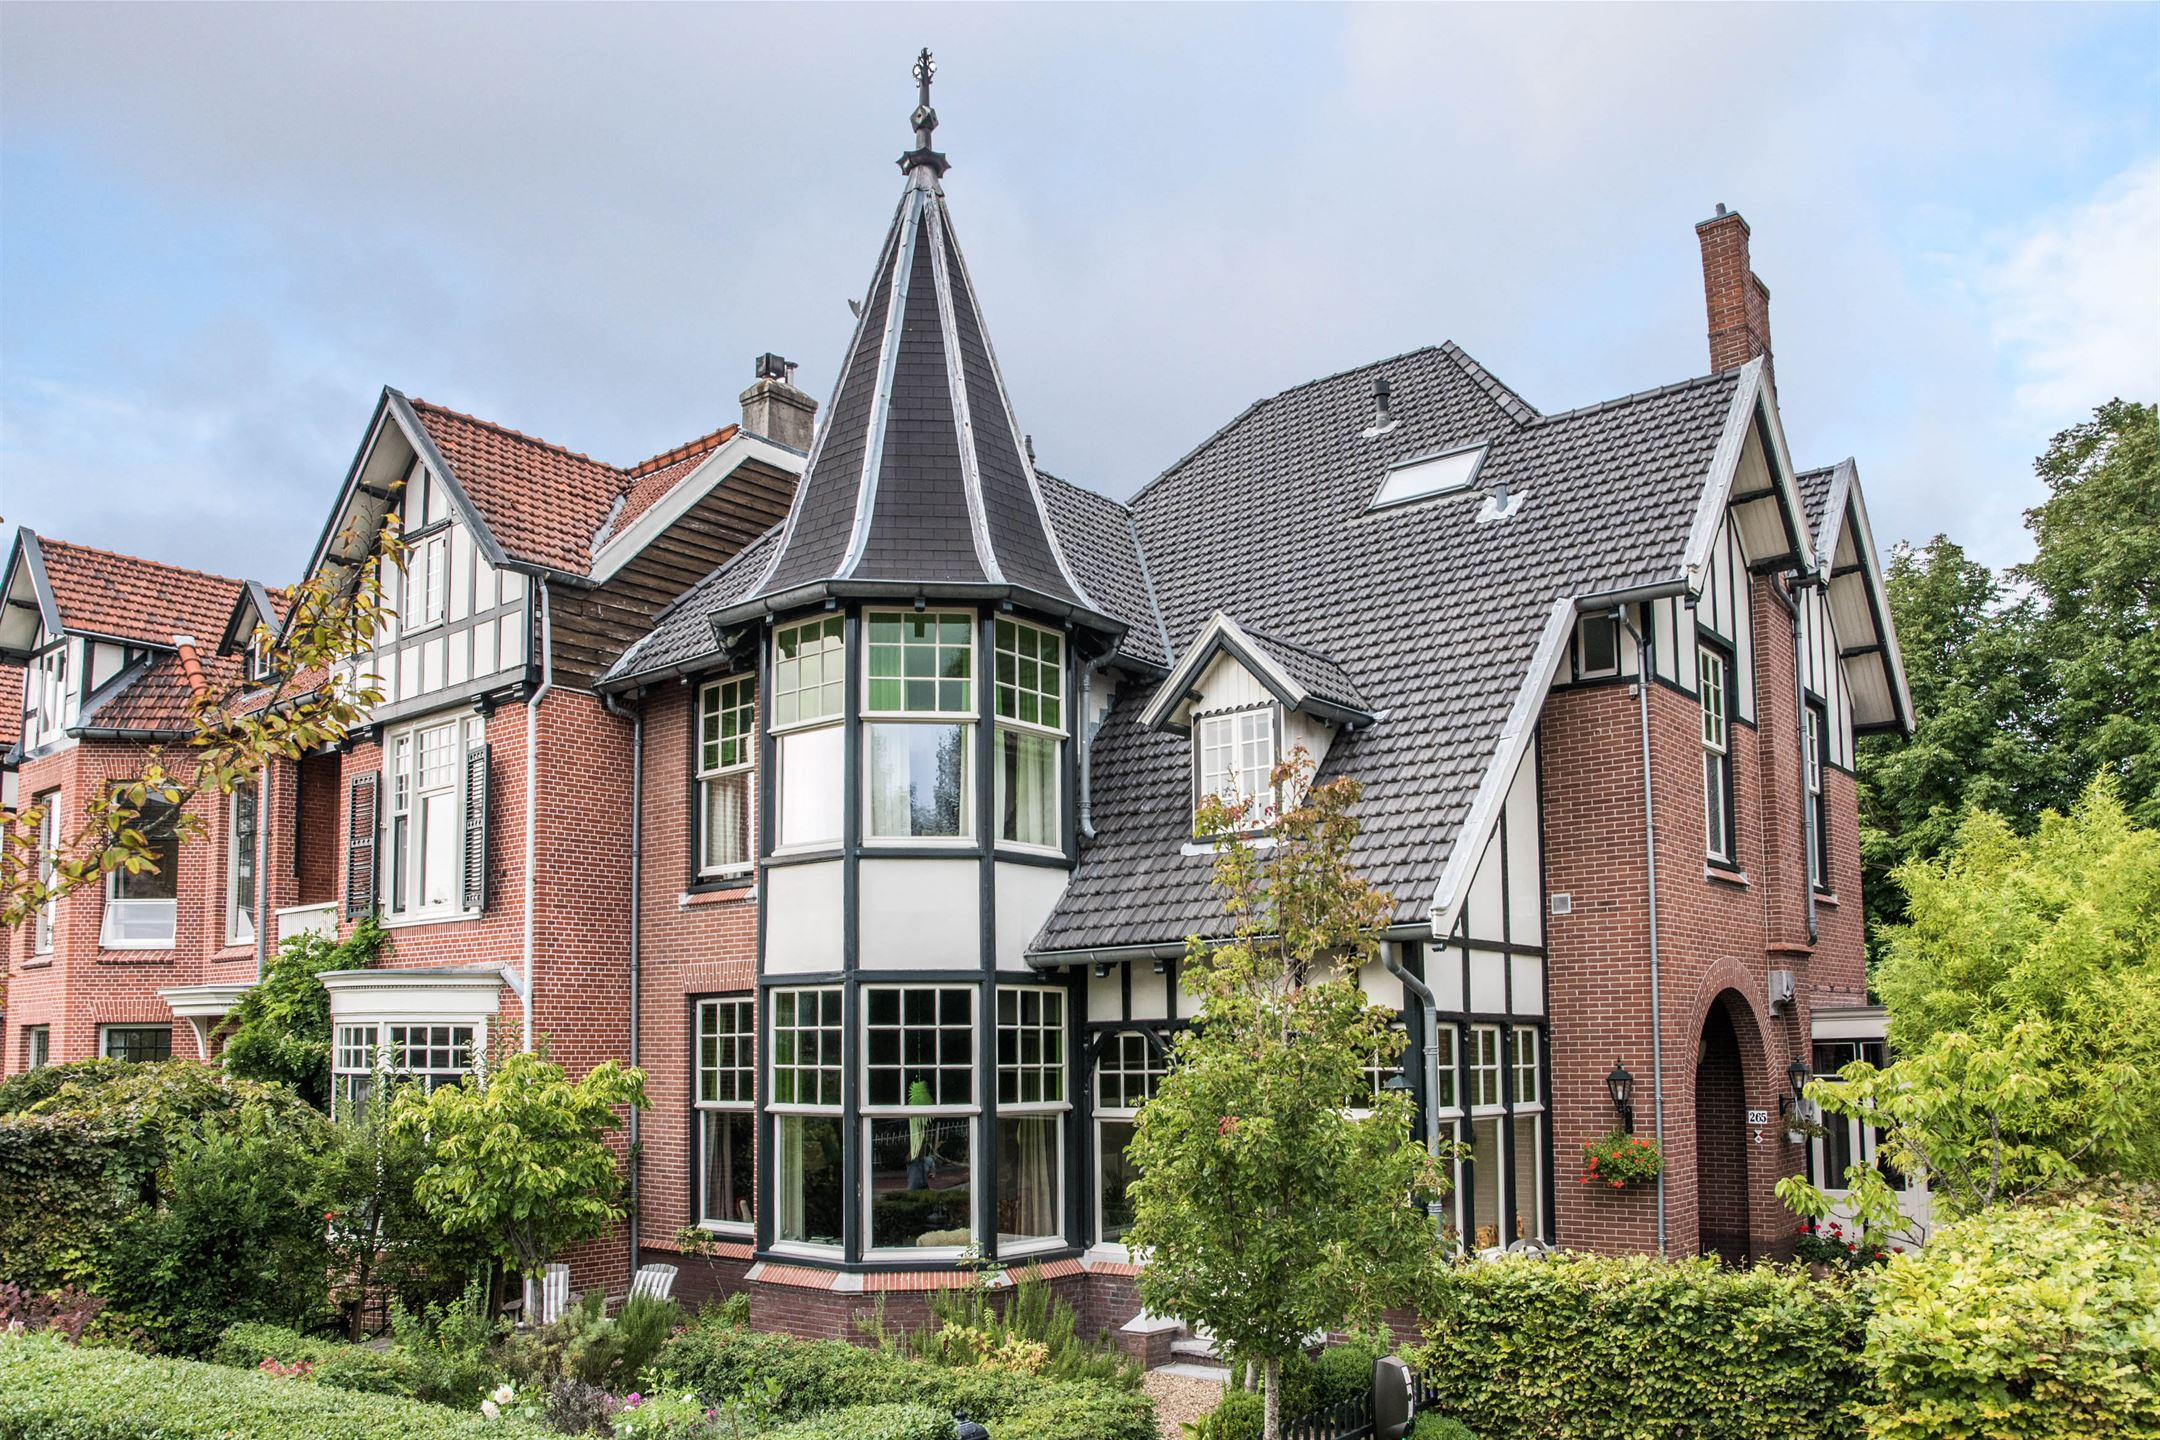 Huis Te Koop Zijlweg 265 2015 Cl Haarlem Funda